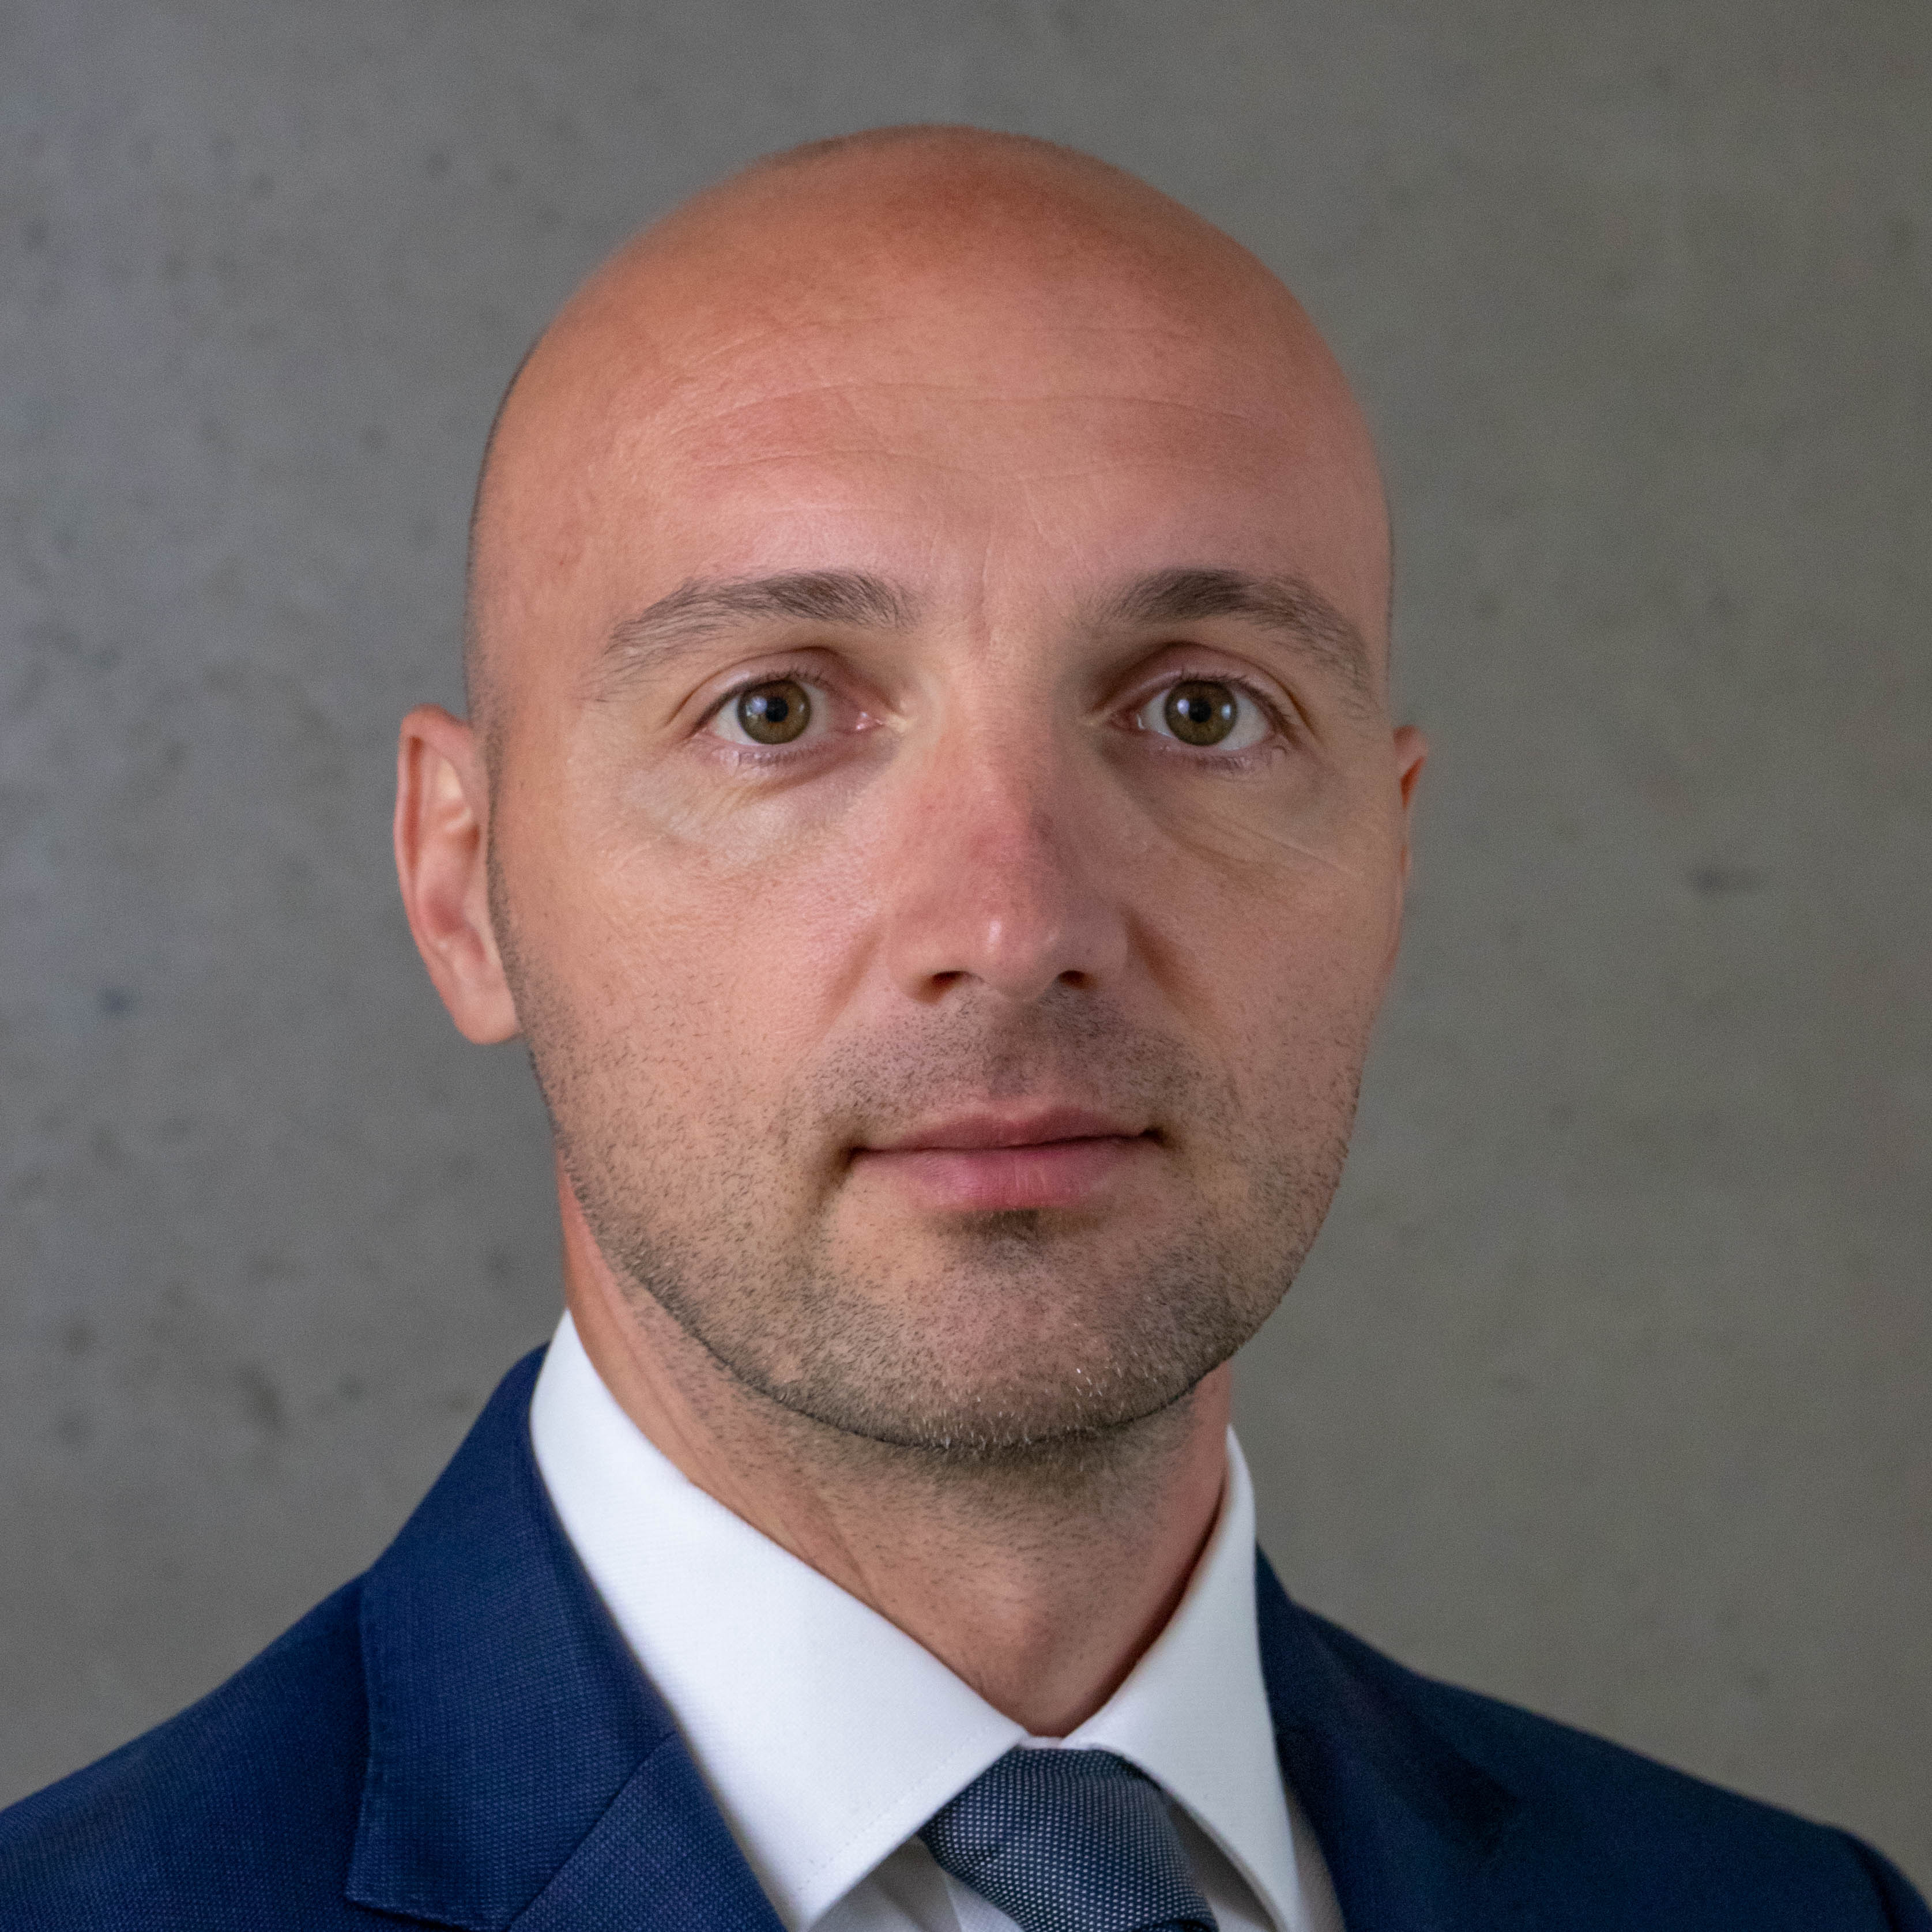 Filip Winkelhofer